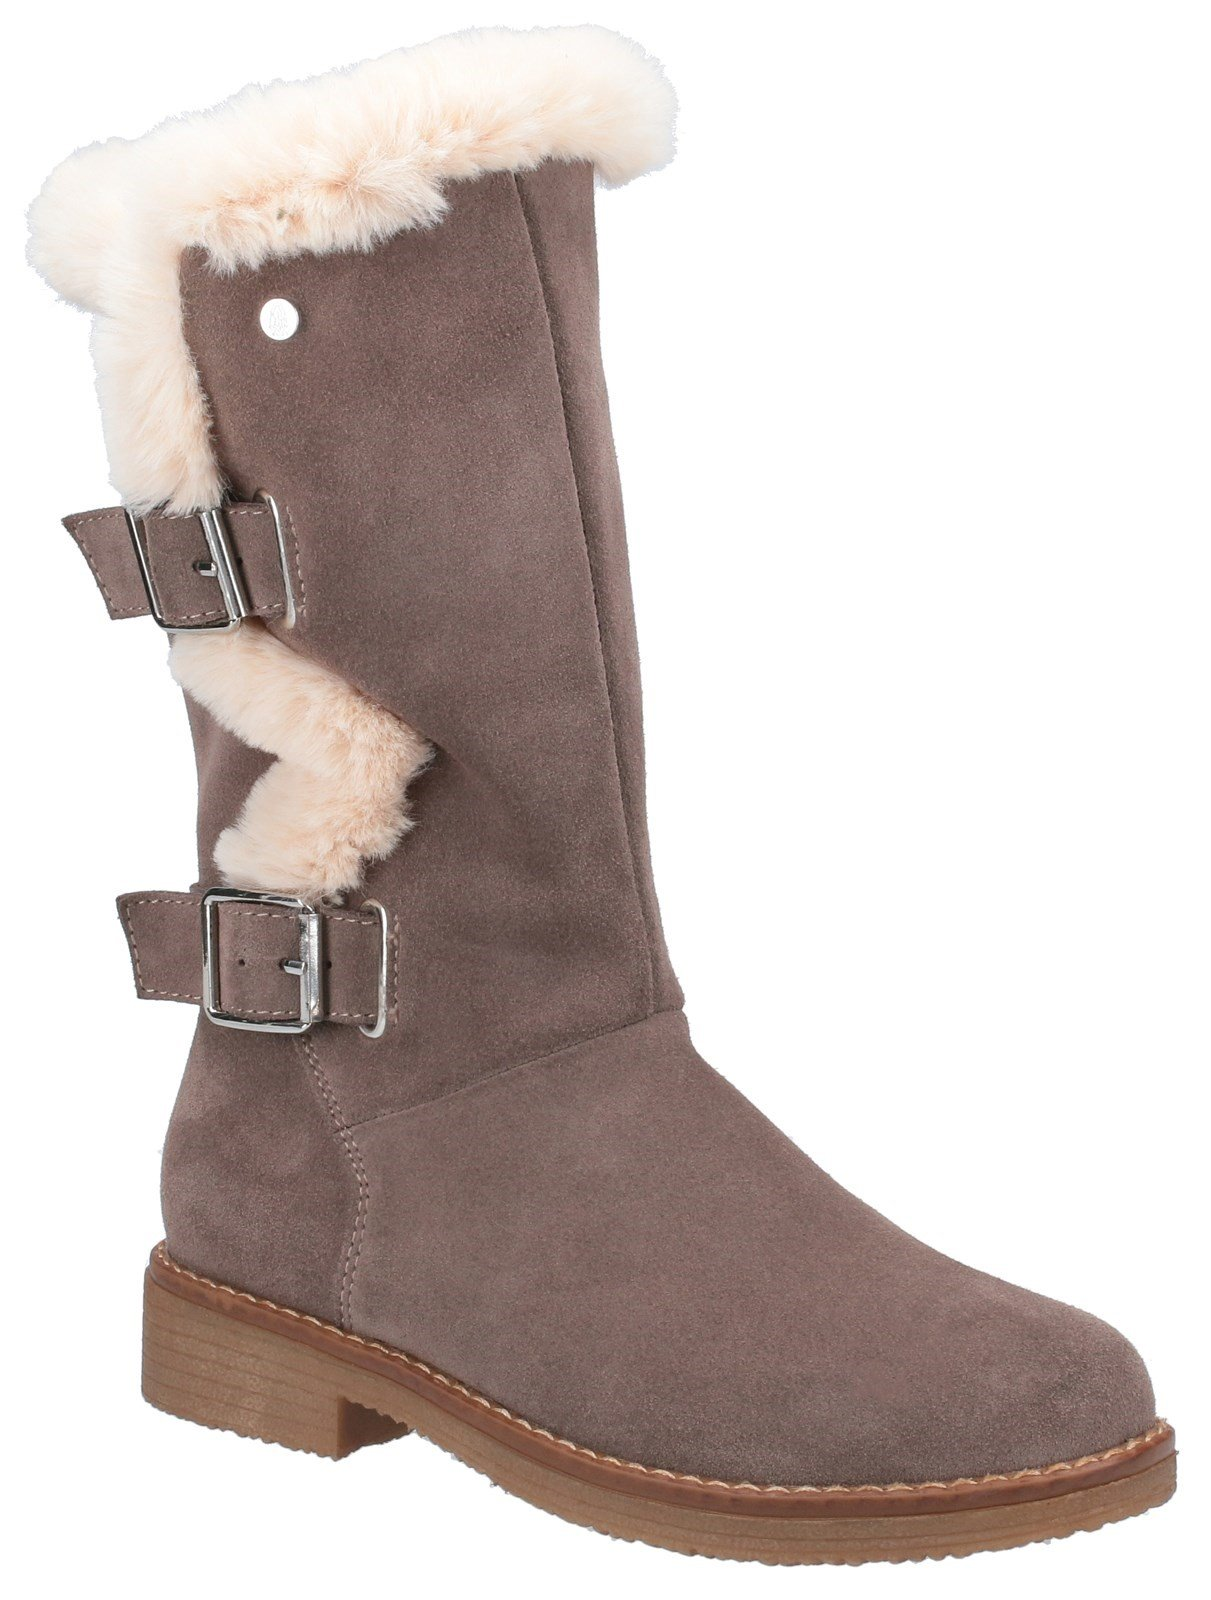 Hush Puppies Women's Megan Mid Boots Various Colours 31217 - Grey 3